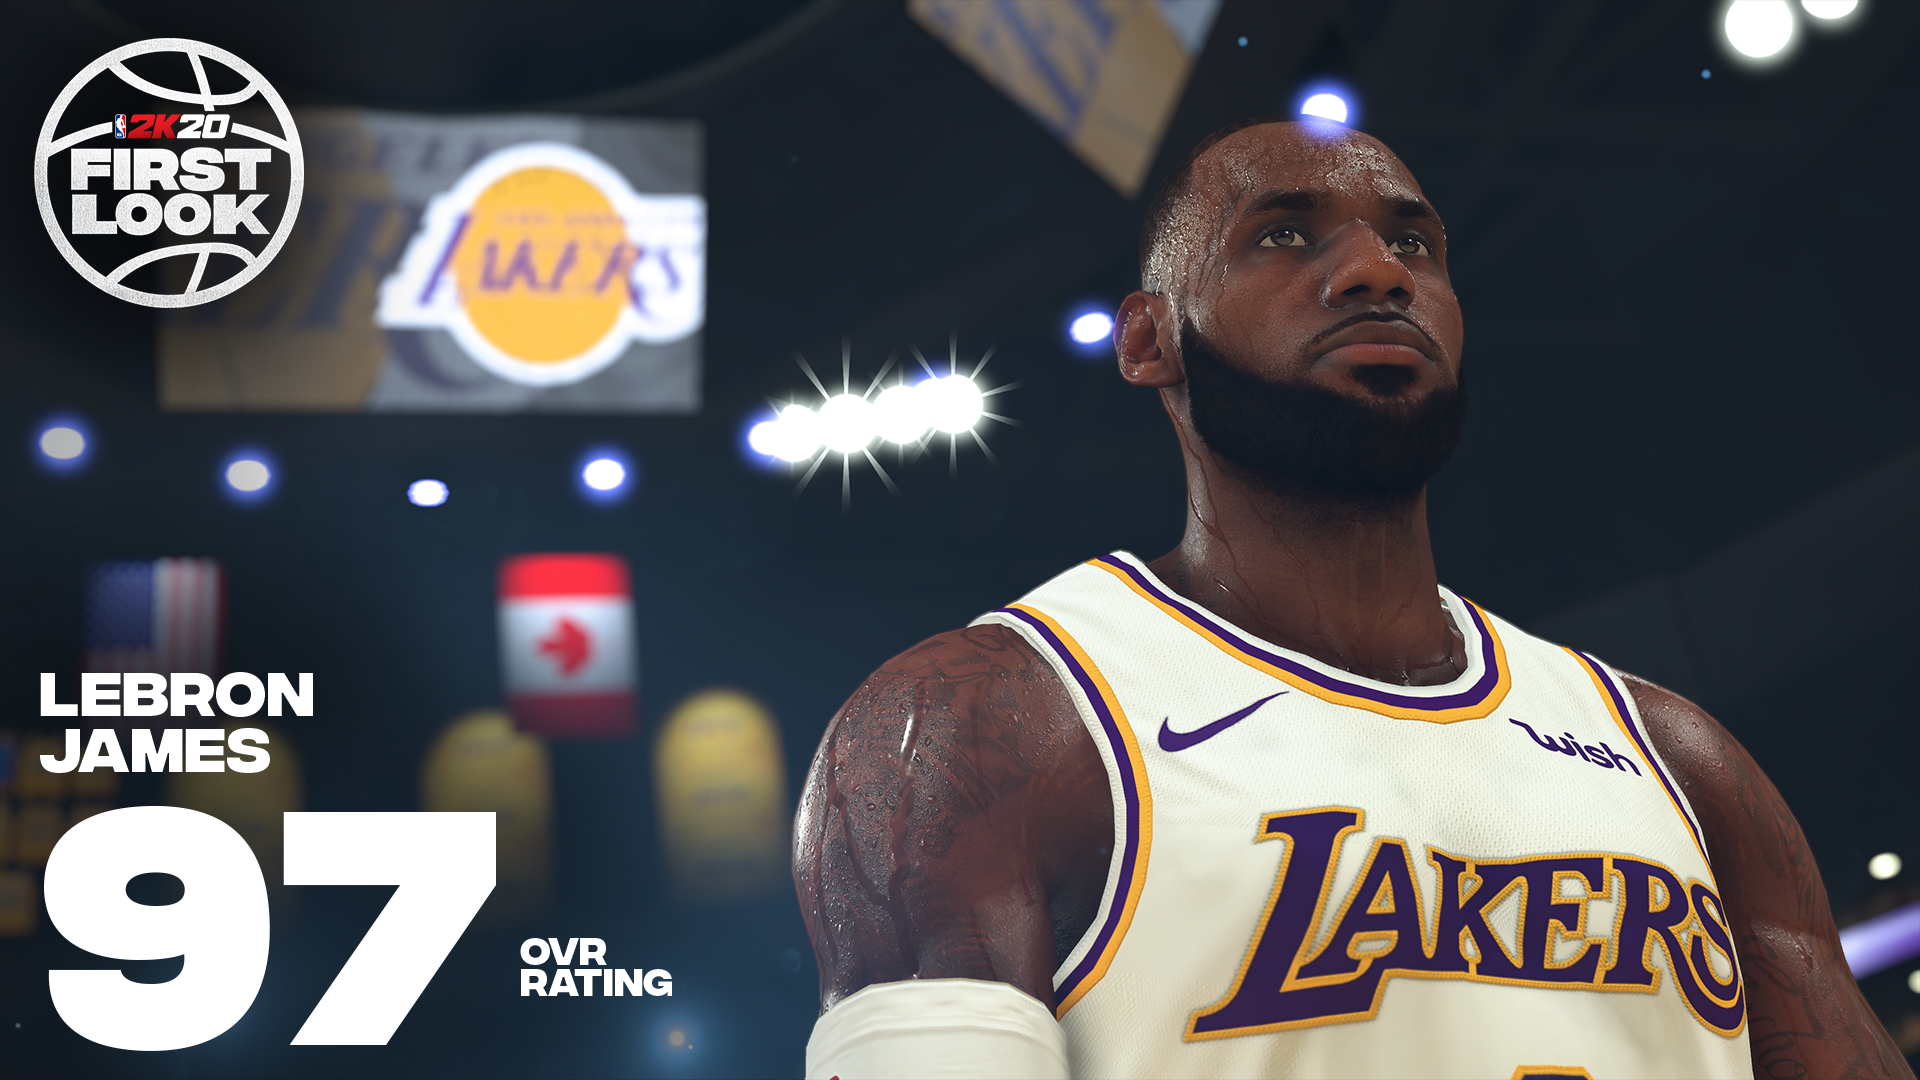 《NBA 2K20》明星球员评分公布!老詹连续10年评分最高